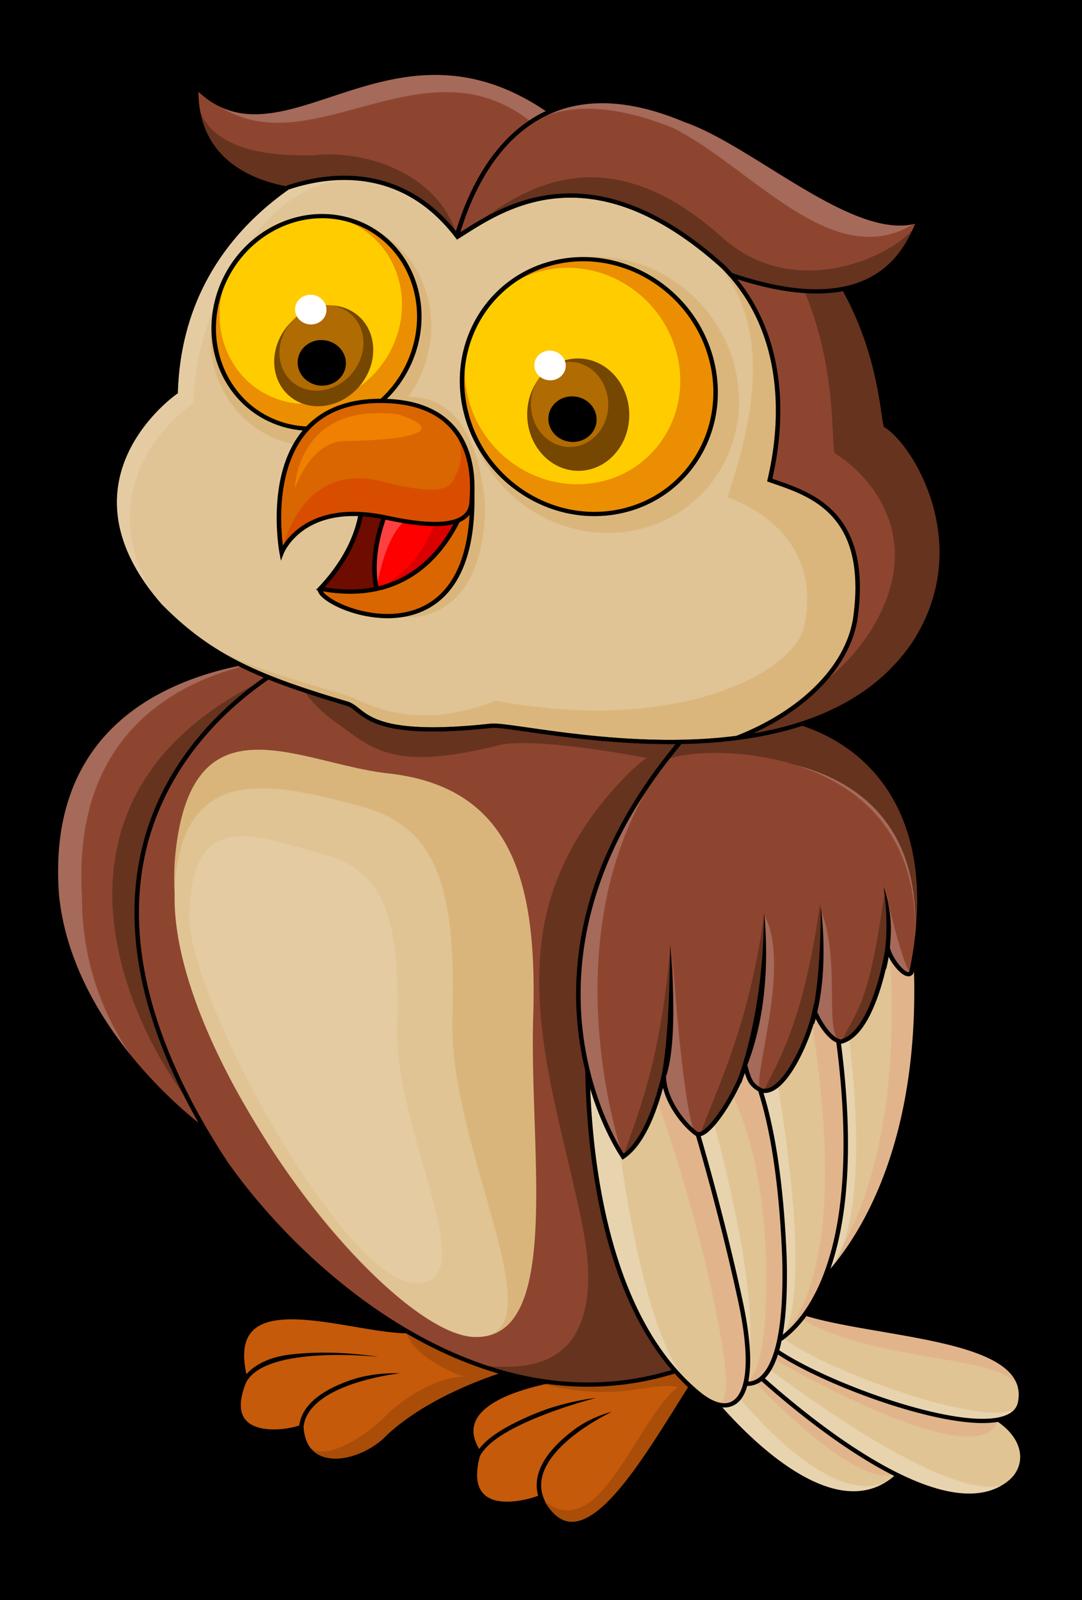 Pirates clipart owl, Pirates owl Transparent FREE for ...